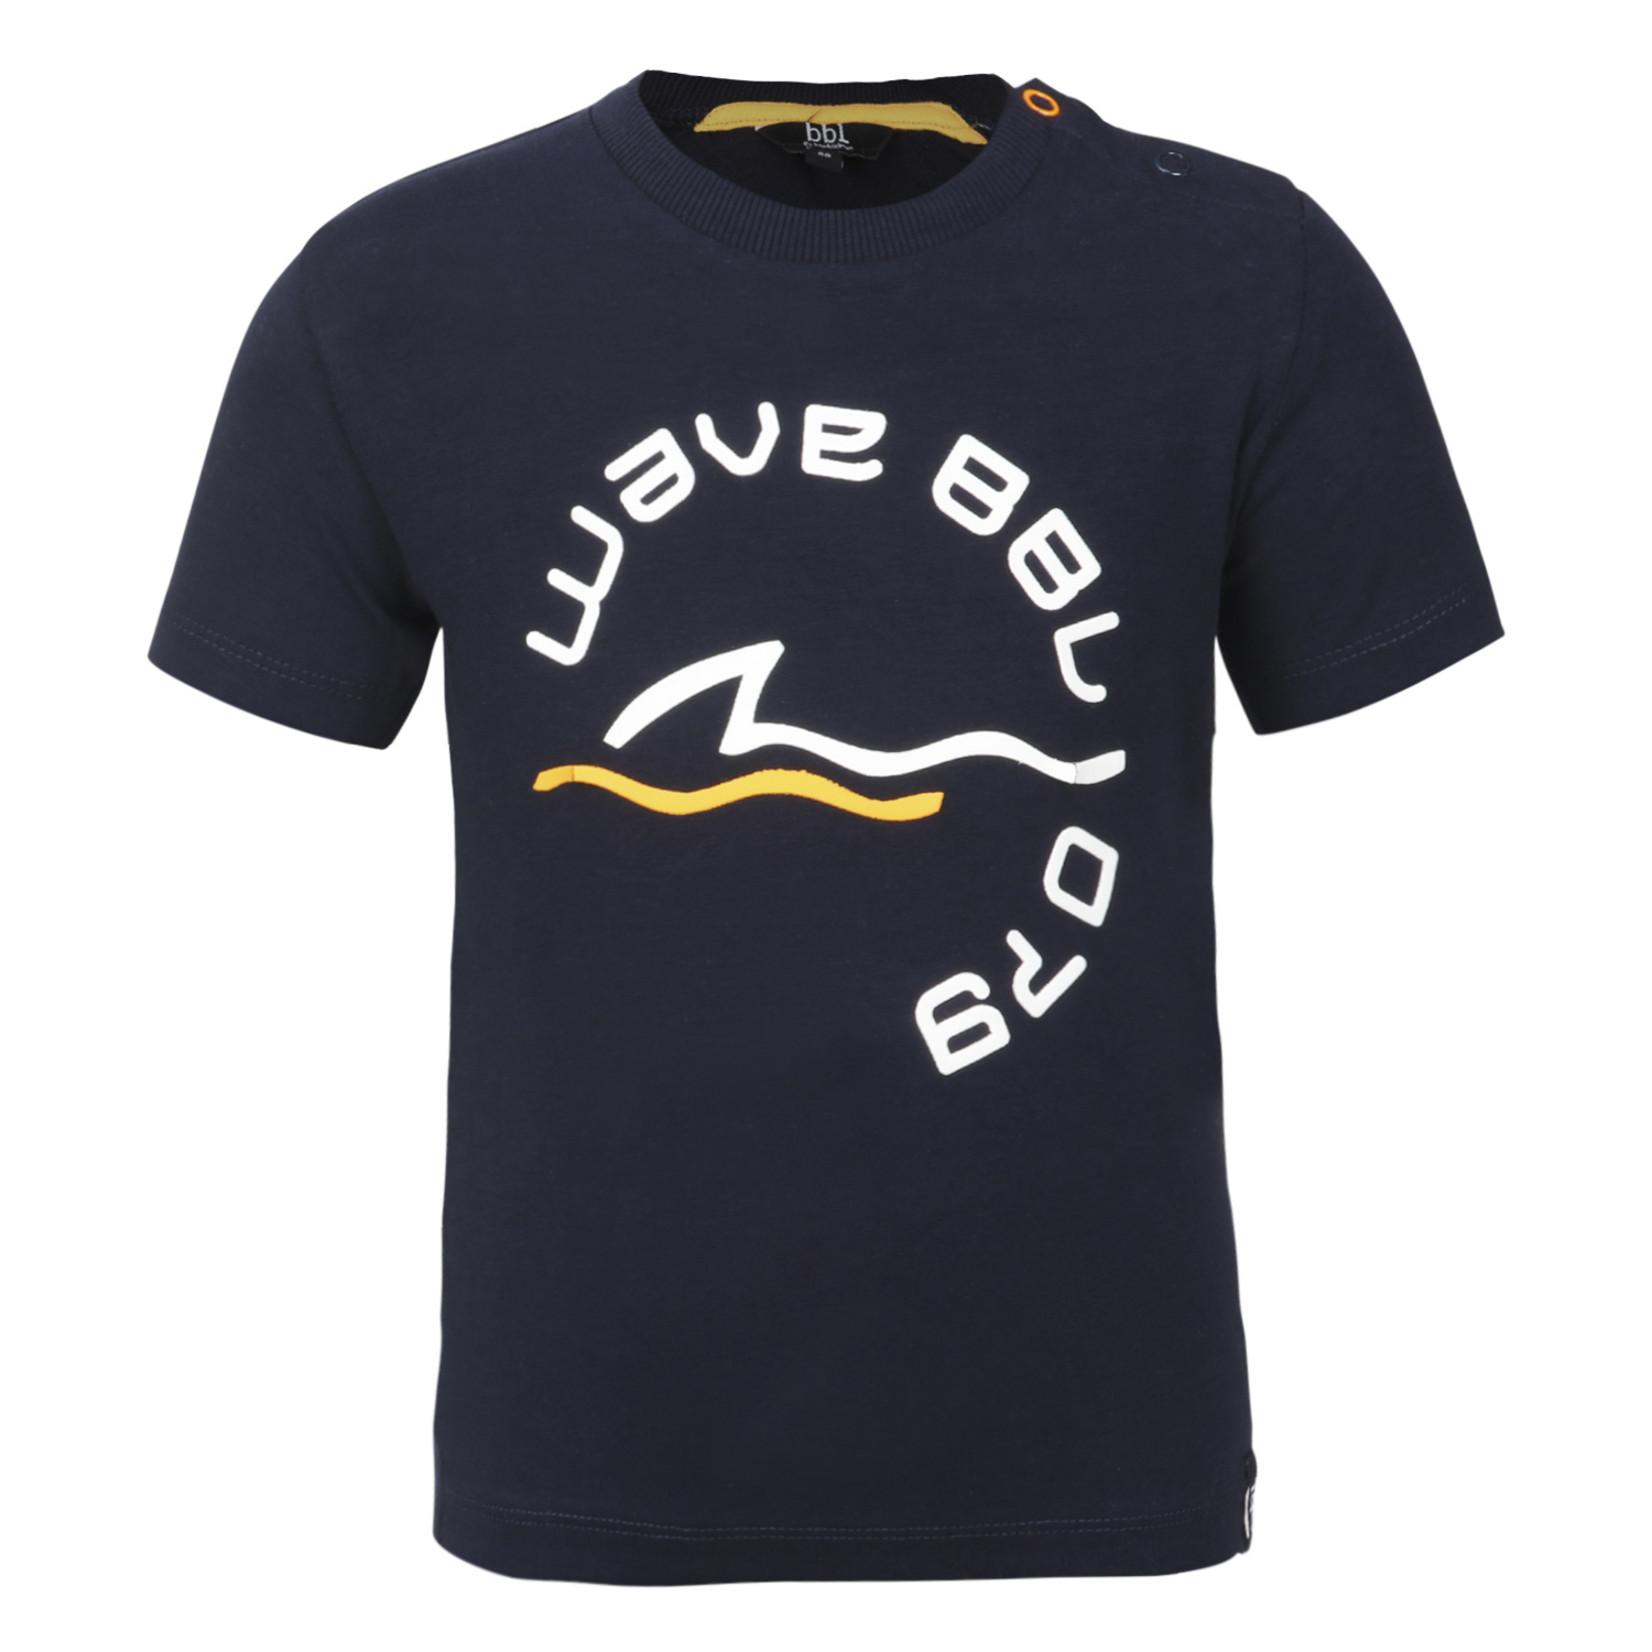 Beebielove T-shirt bbl 2603